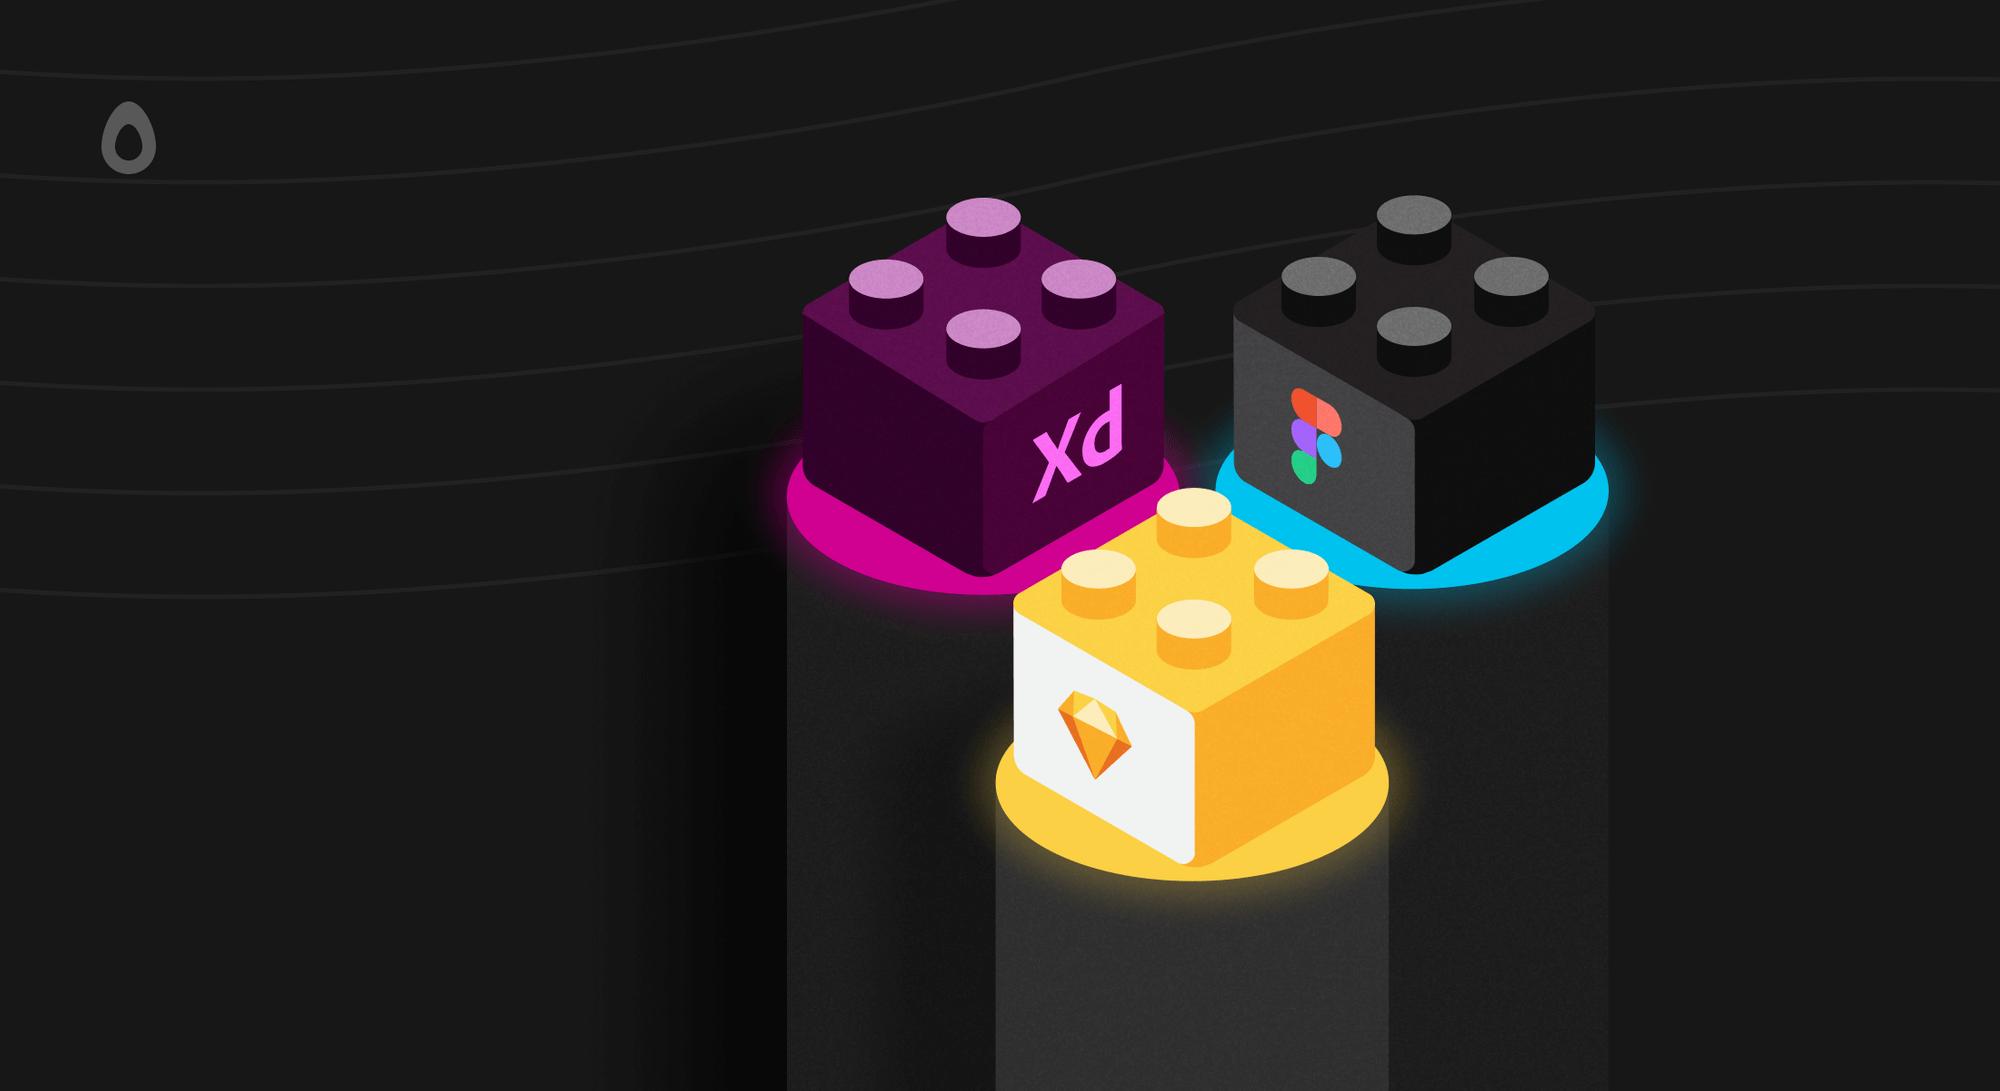 Adobe XD CC 36.2.32 Crack + Torrent (Latest) Free Download